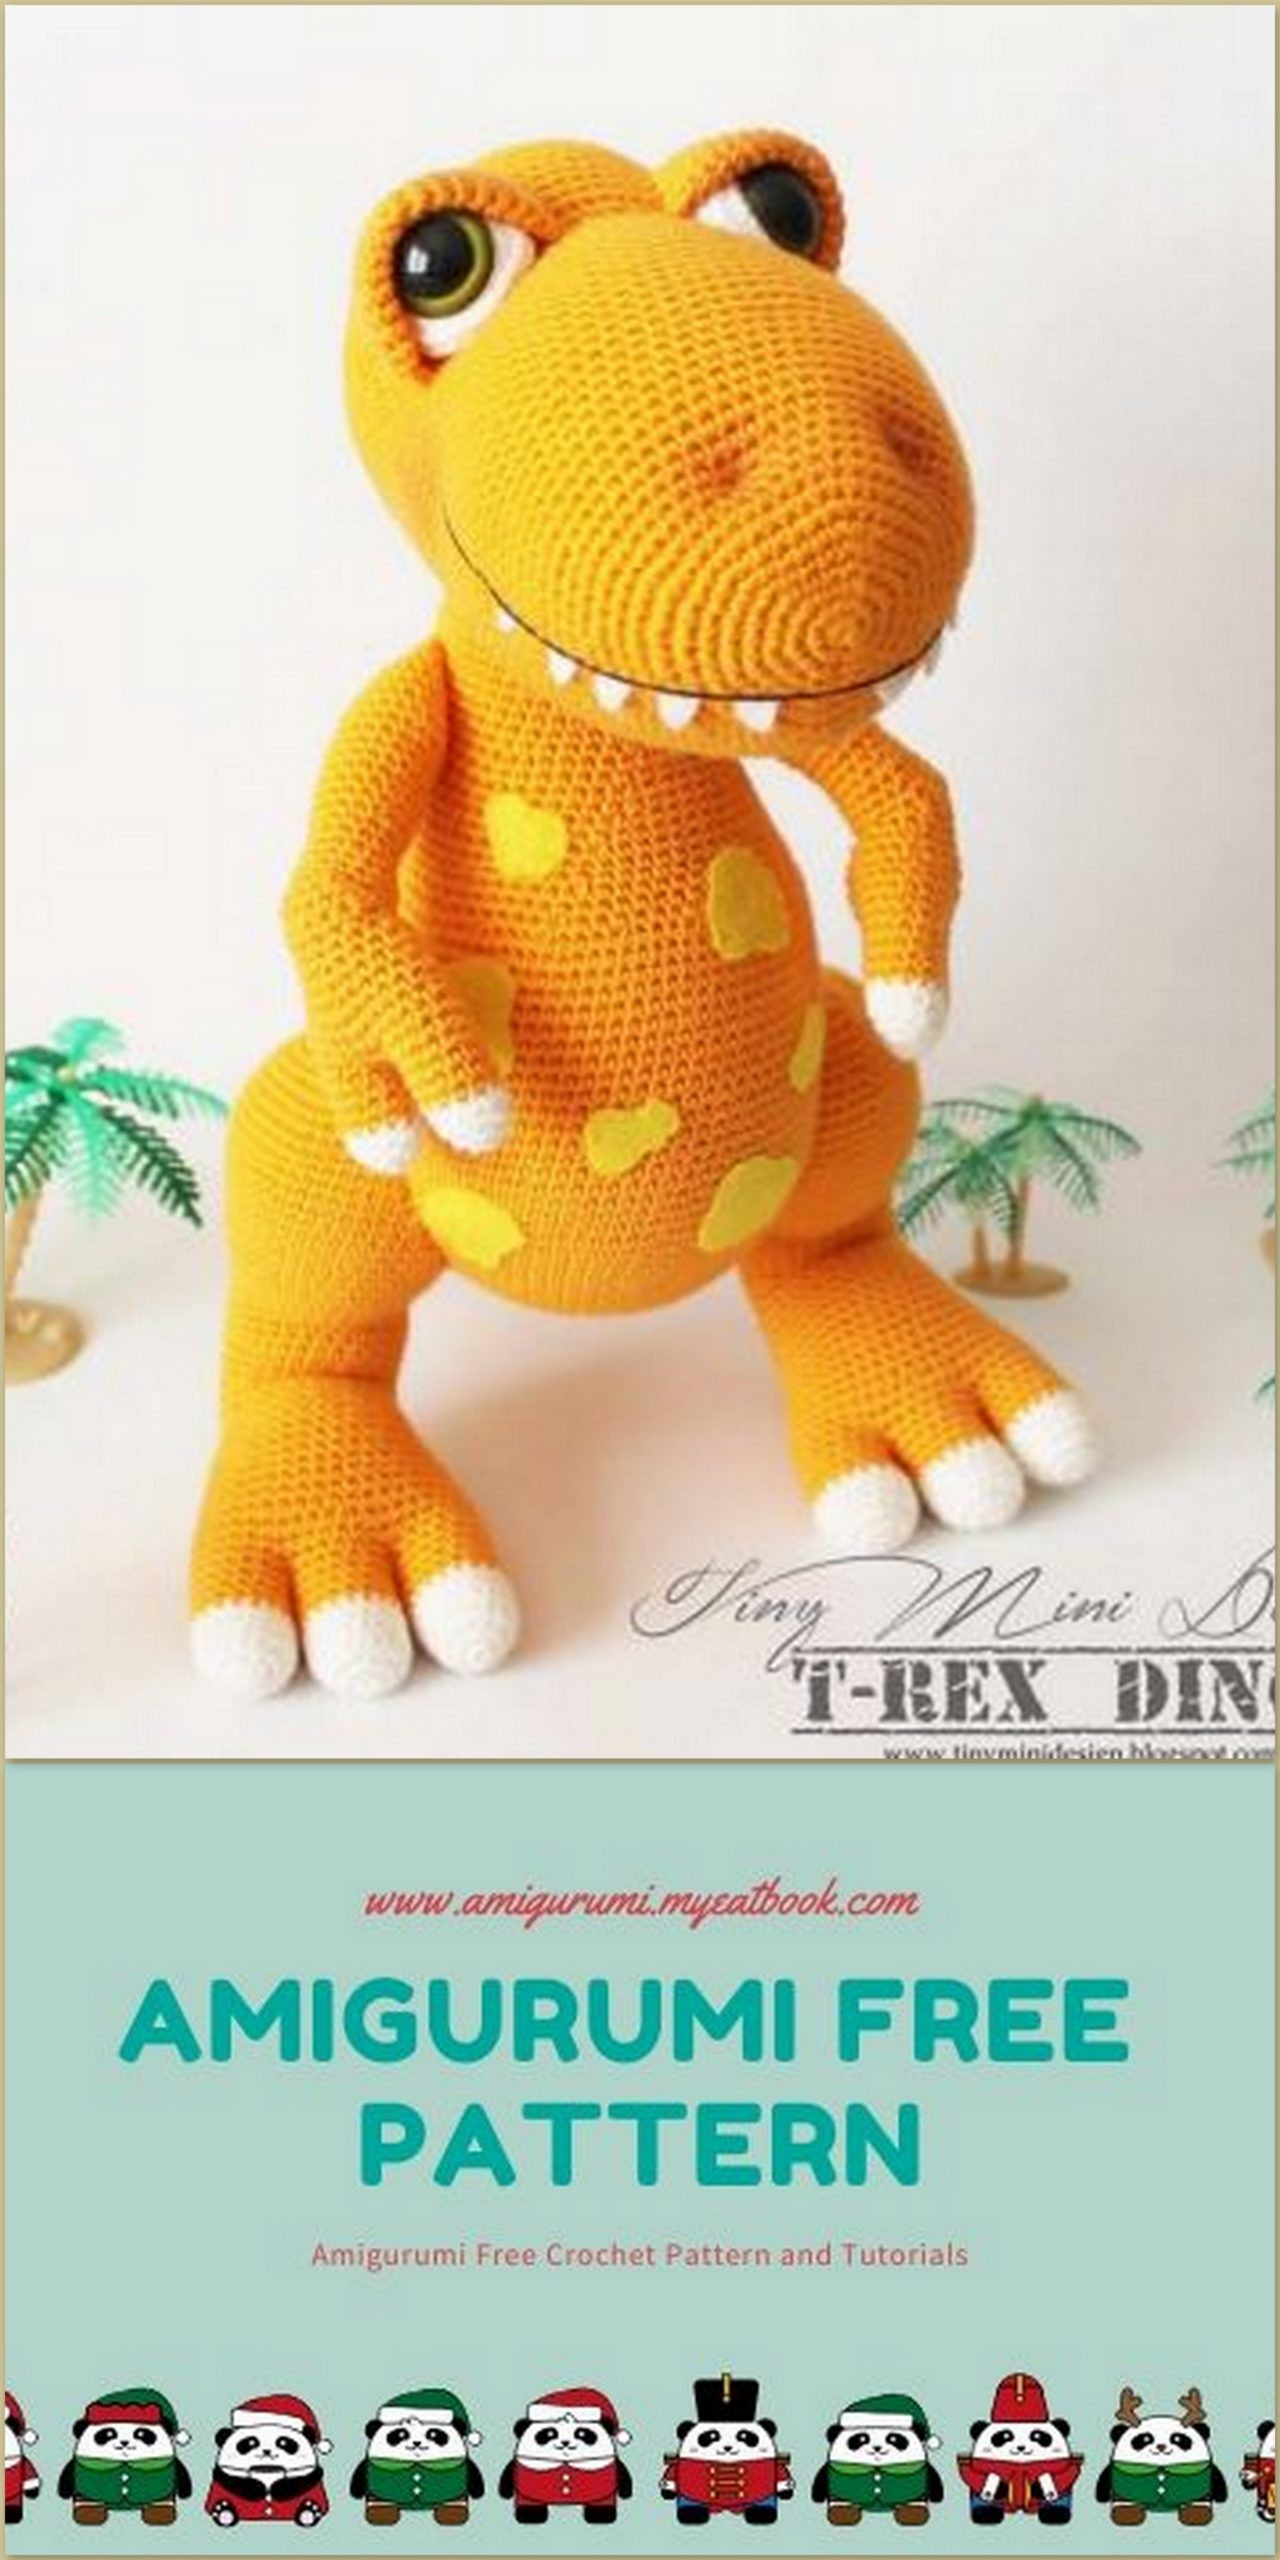 Sleeping Giraffe Amigurumi free crochet pattern - Amigu World | 2560x1280